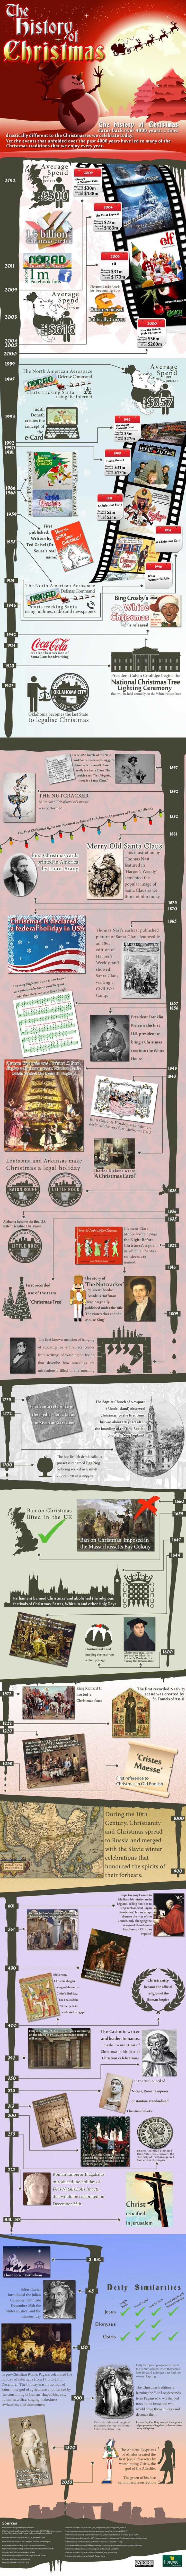 Historia de la Navidad (USA)